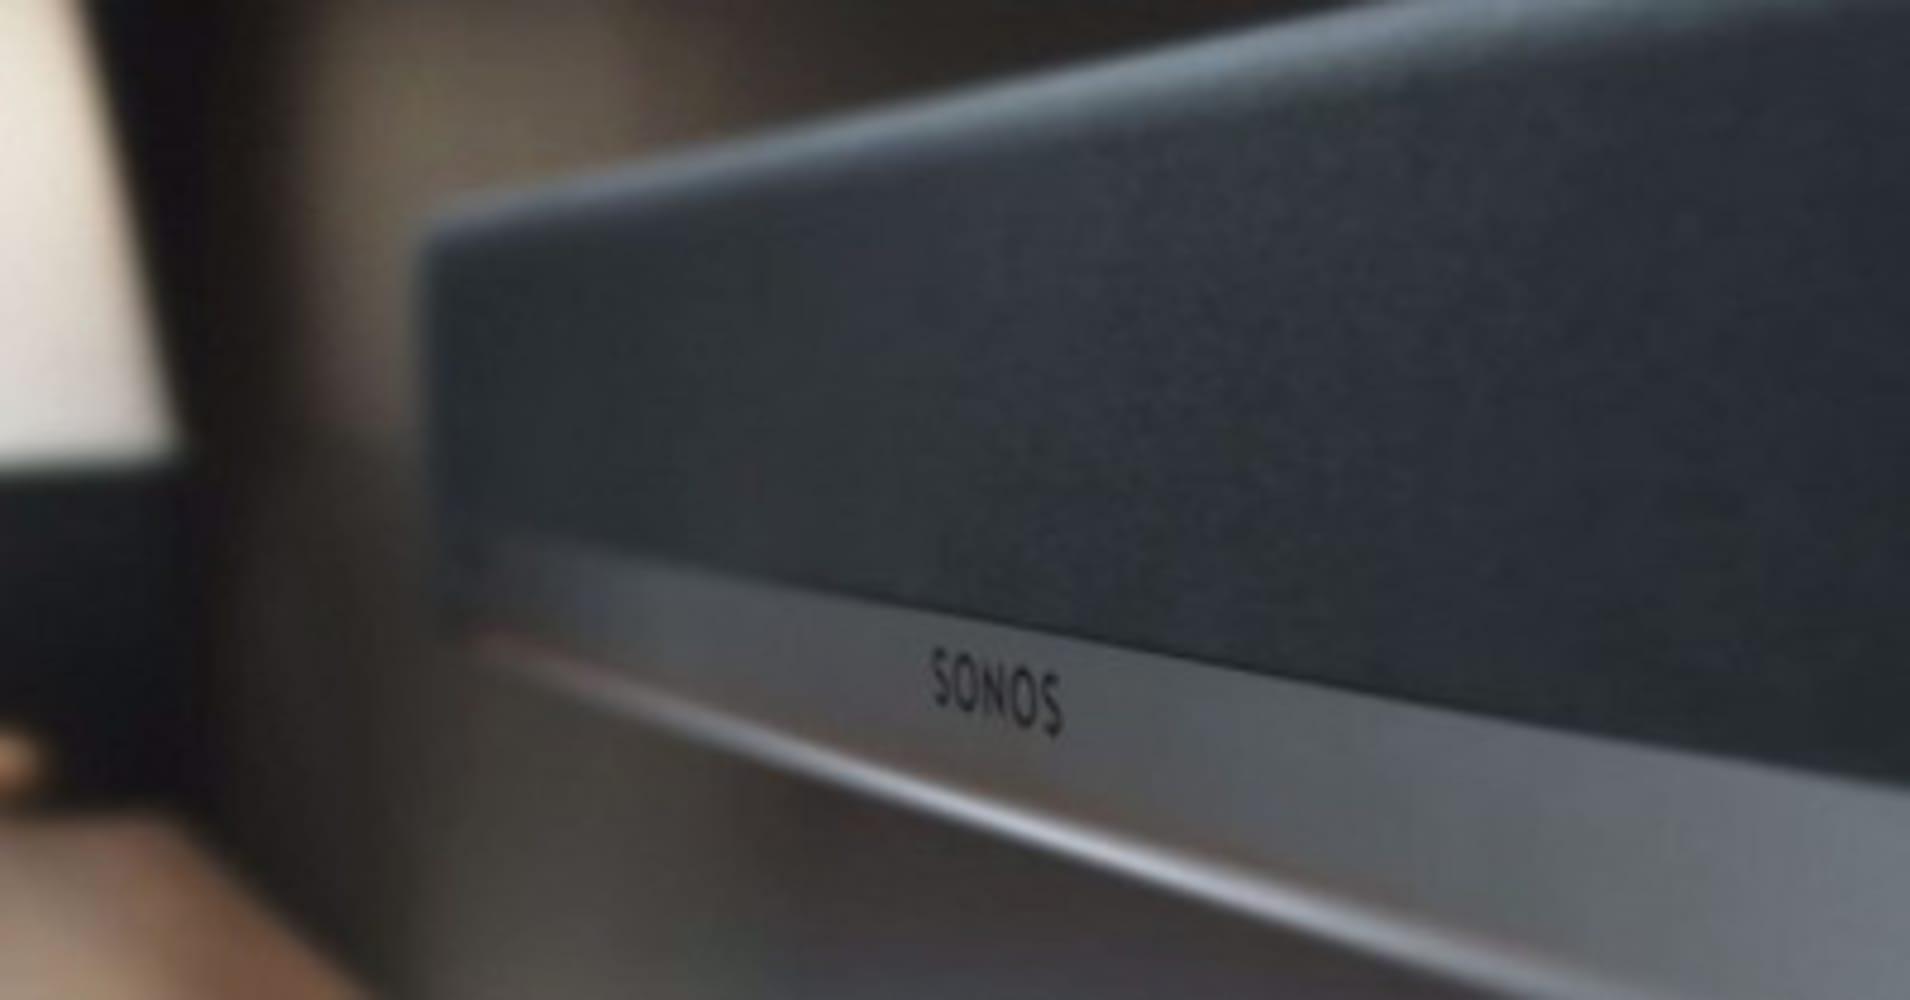 Sonos Sono Ipo Stock Starts Trading On The Nasdaq